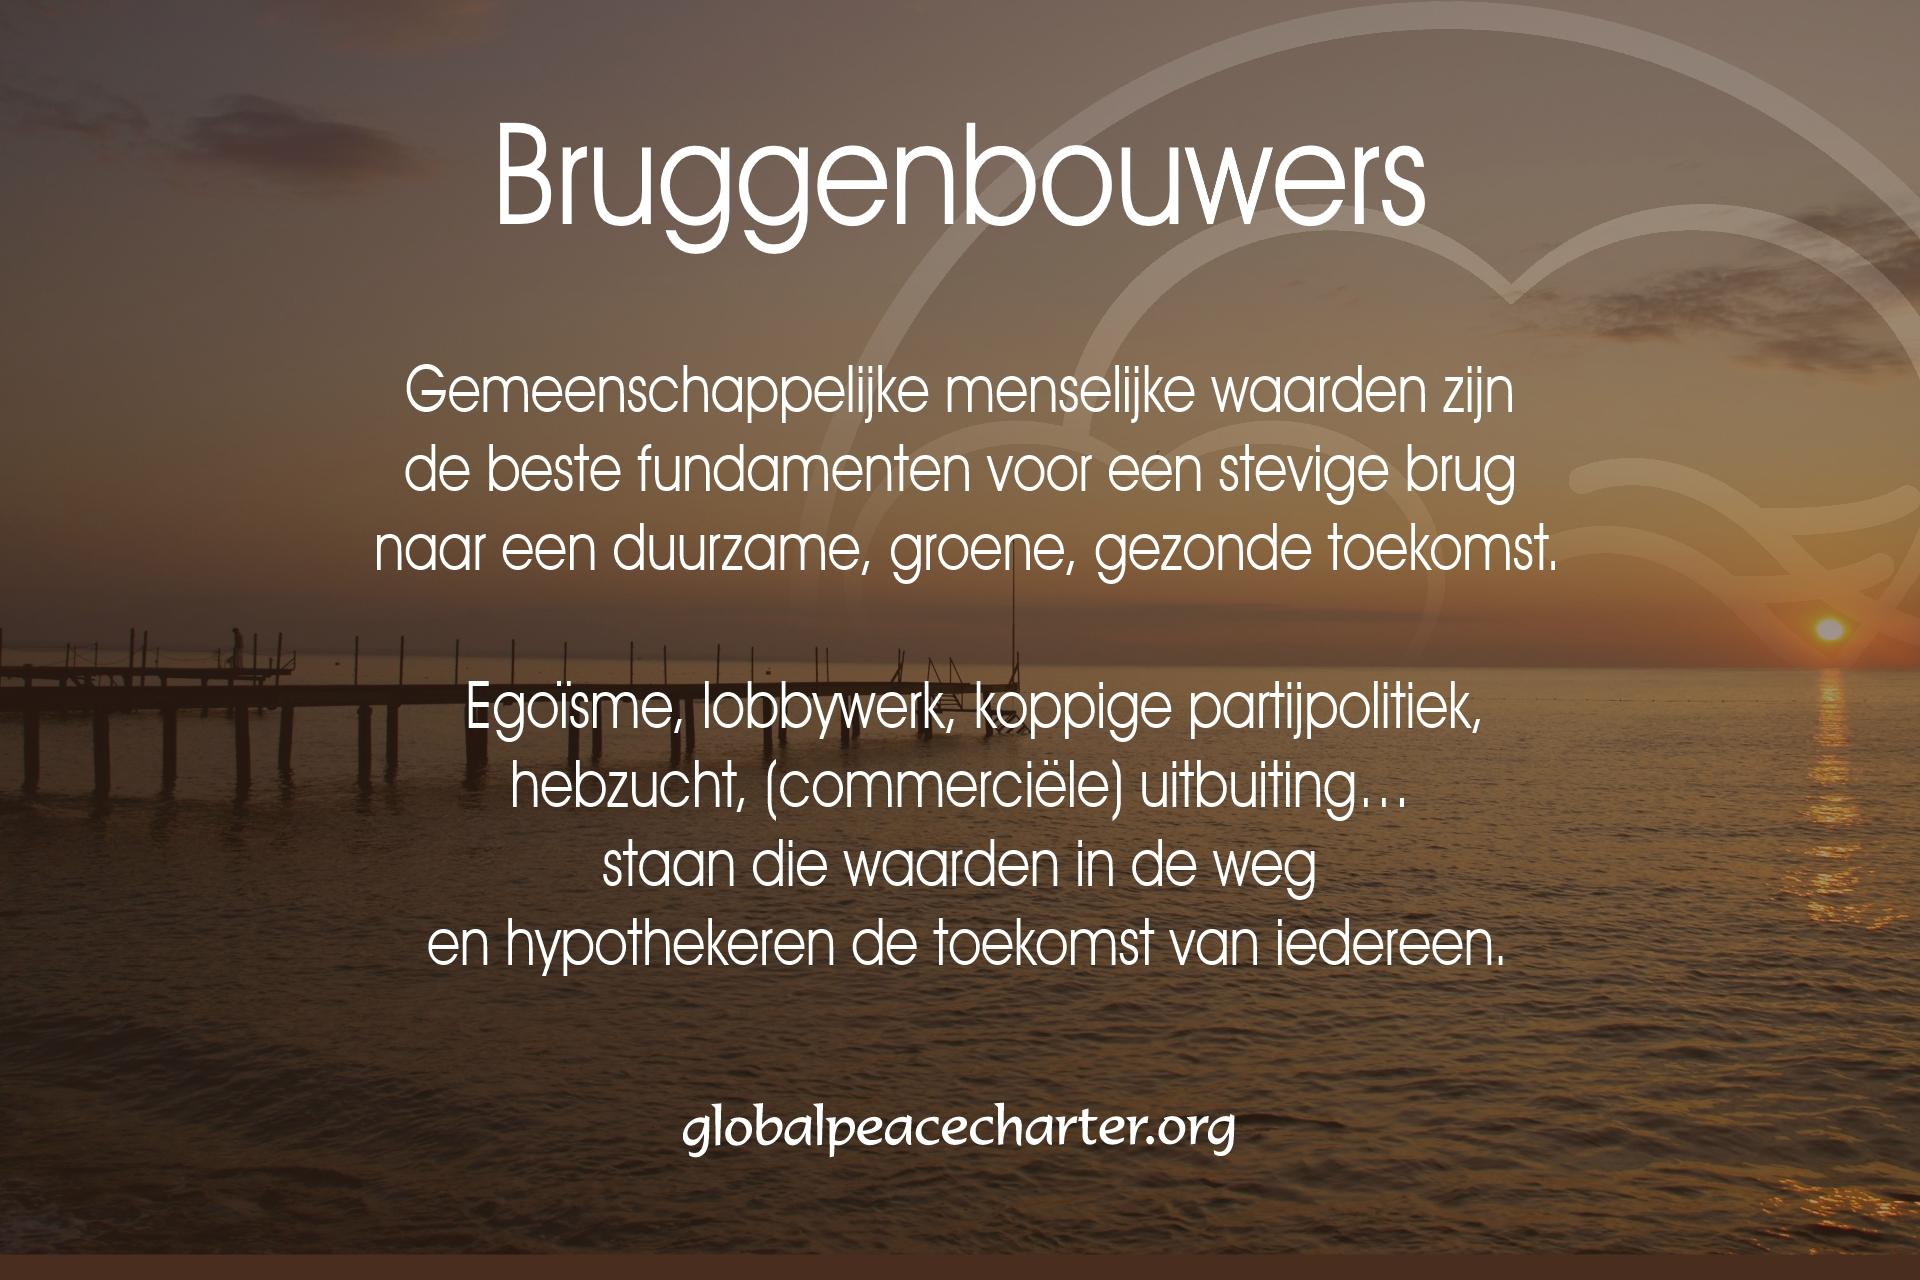 Bruggenbouwers